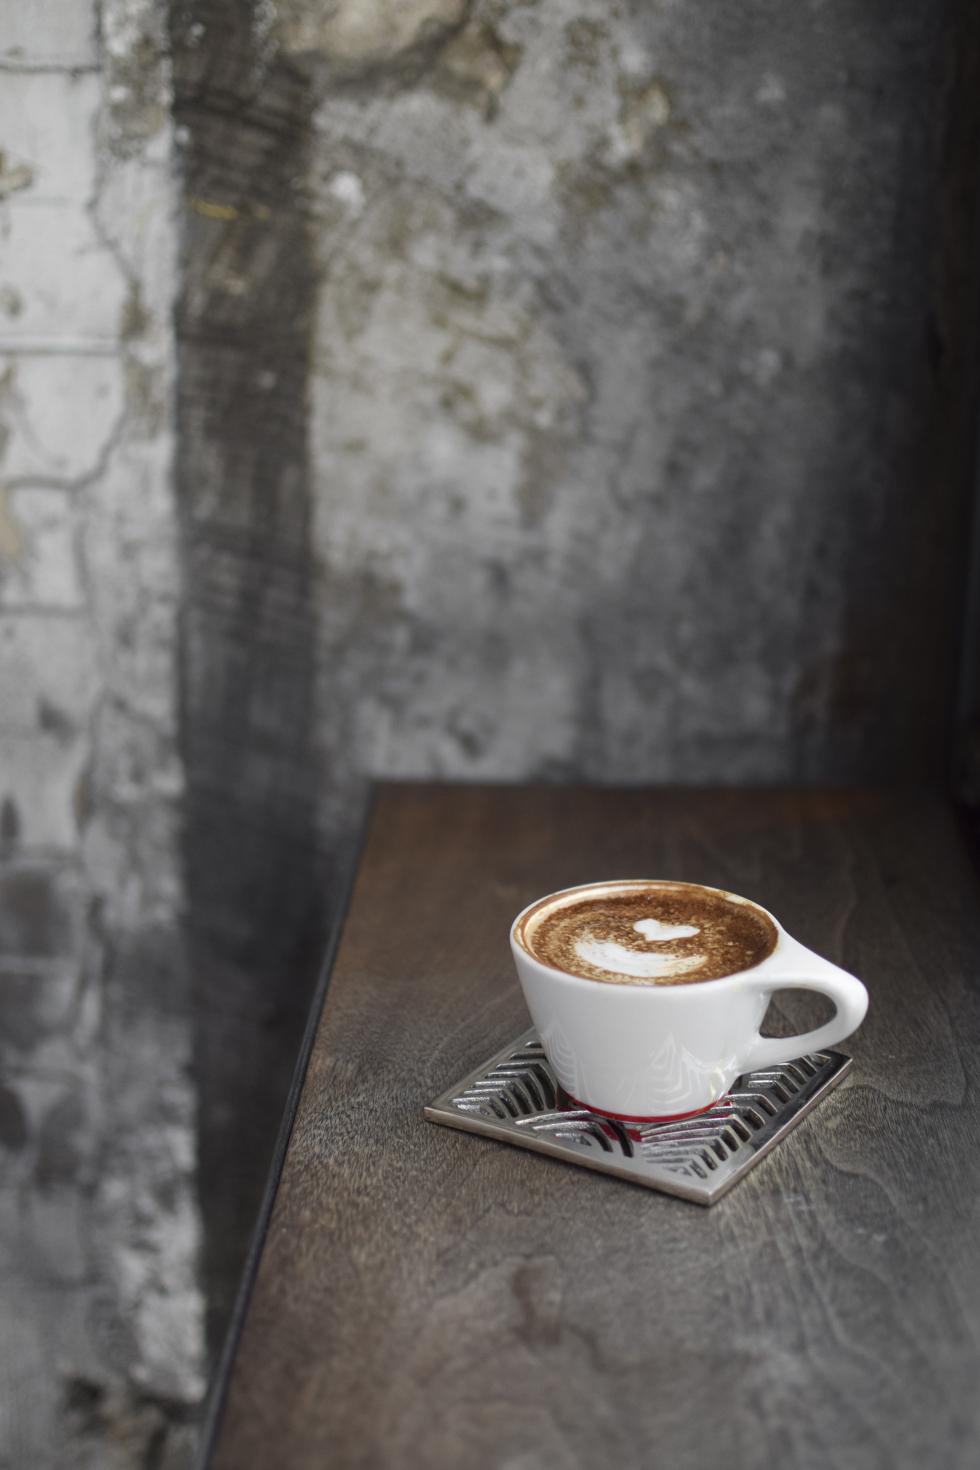 sanne_gasoline_alley_coffee_new_york_detalj_2